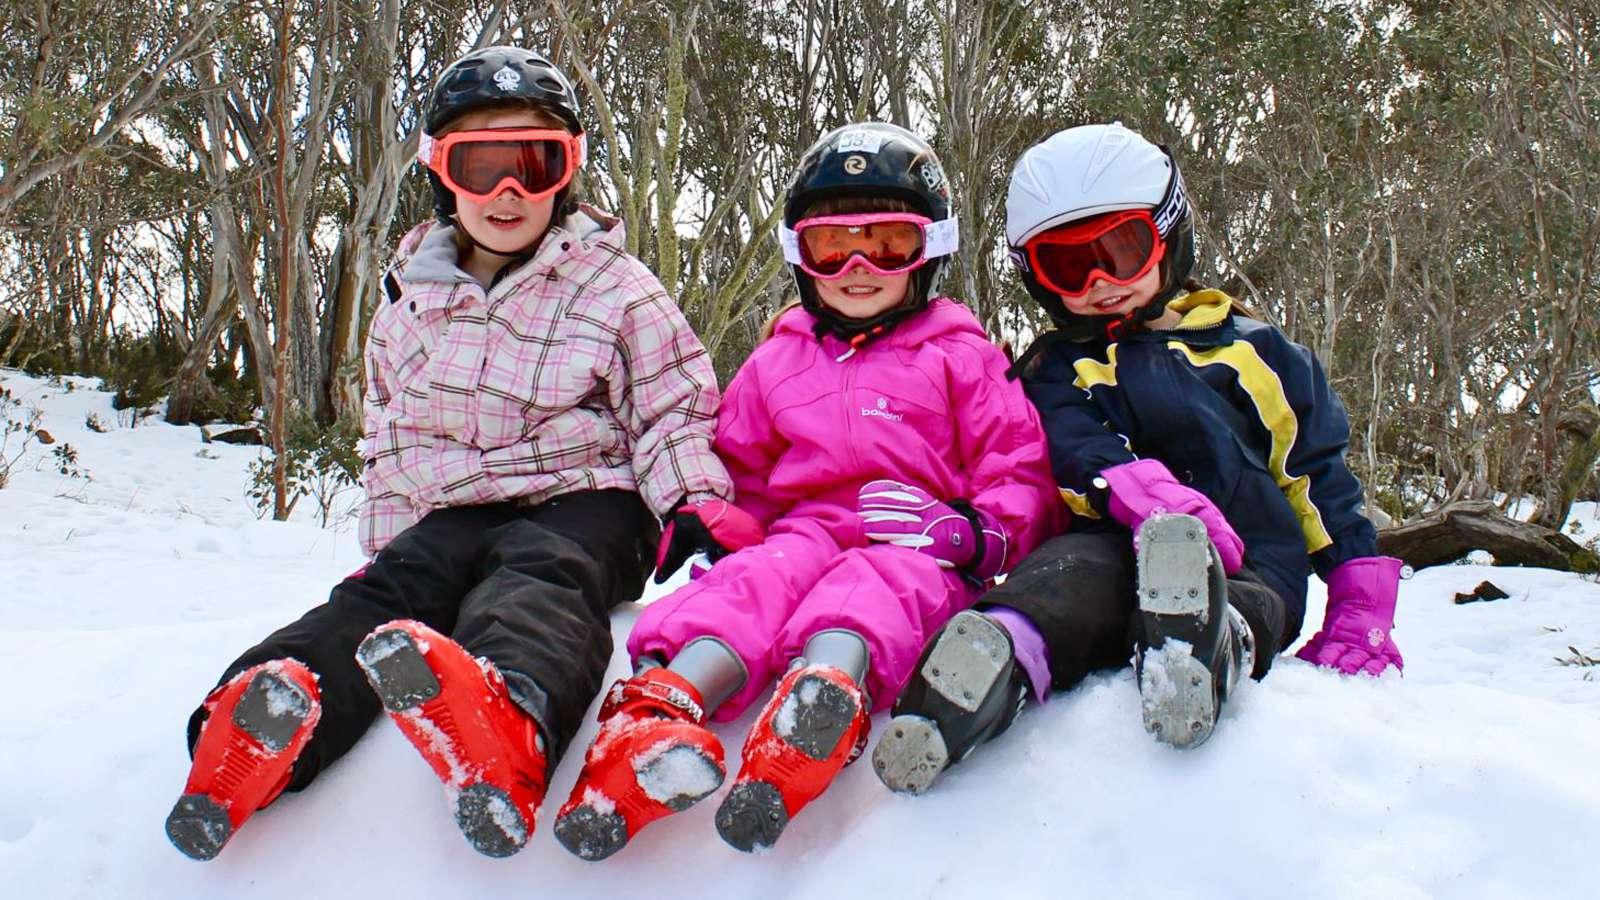 Ski Jacket and Pants Hire for Kids  cec0b74e1